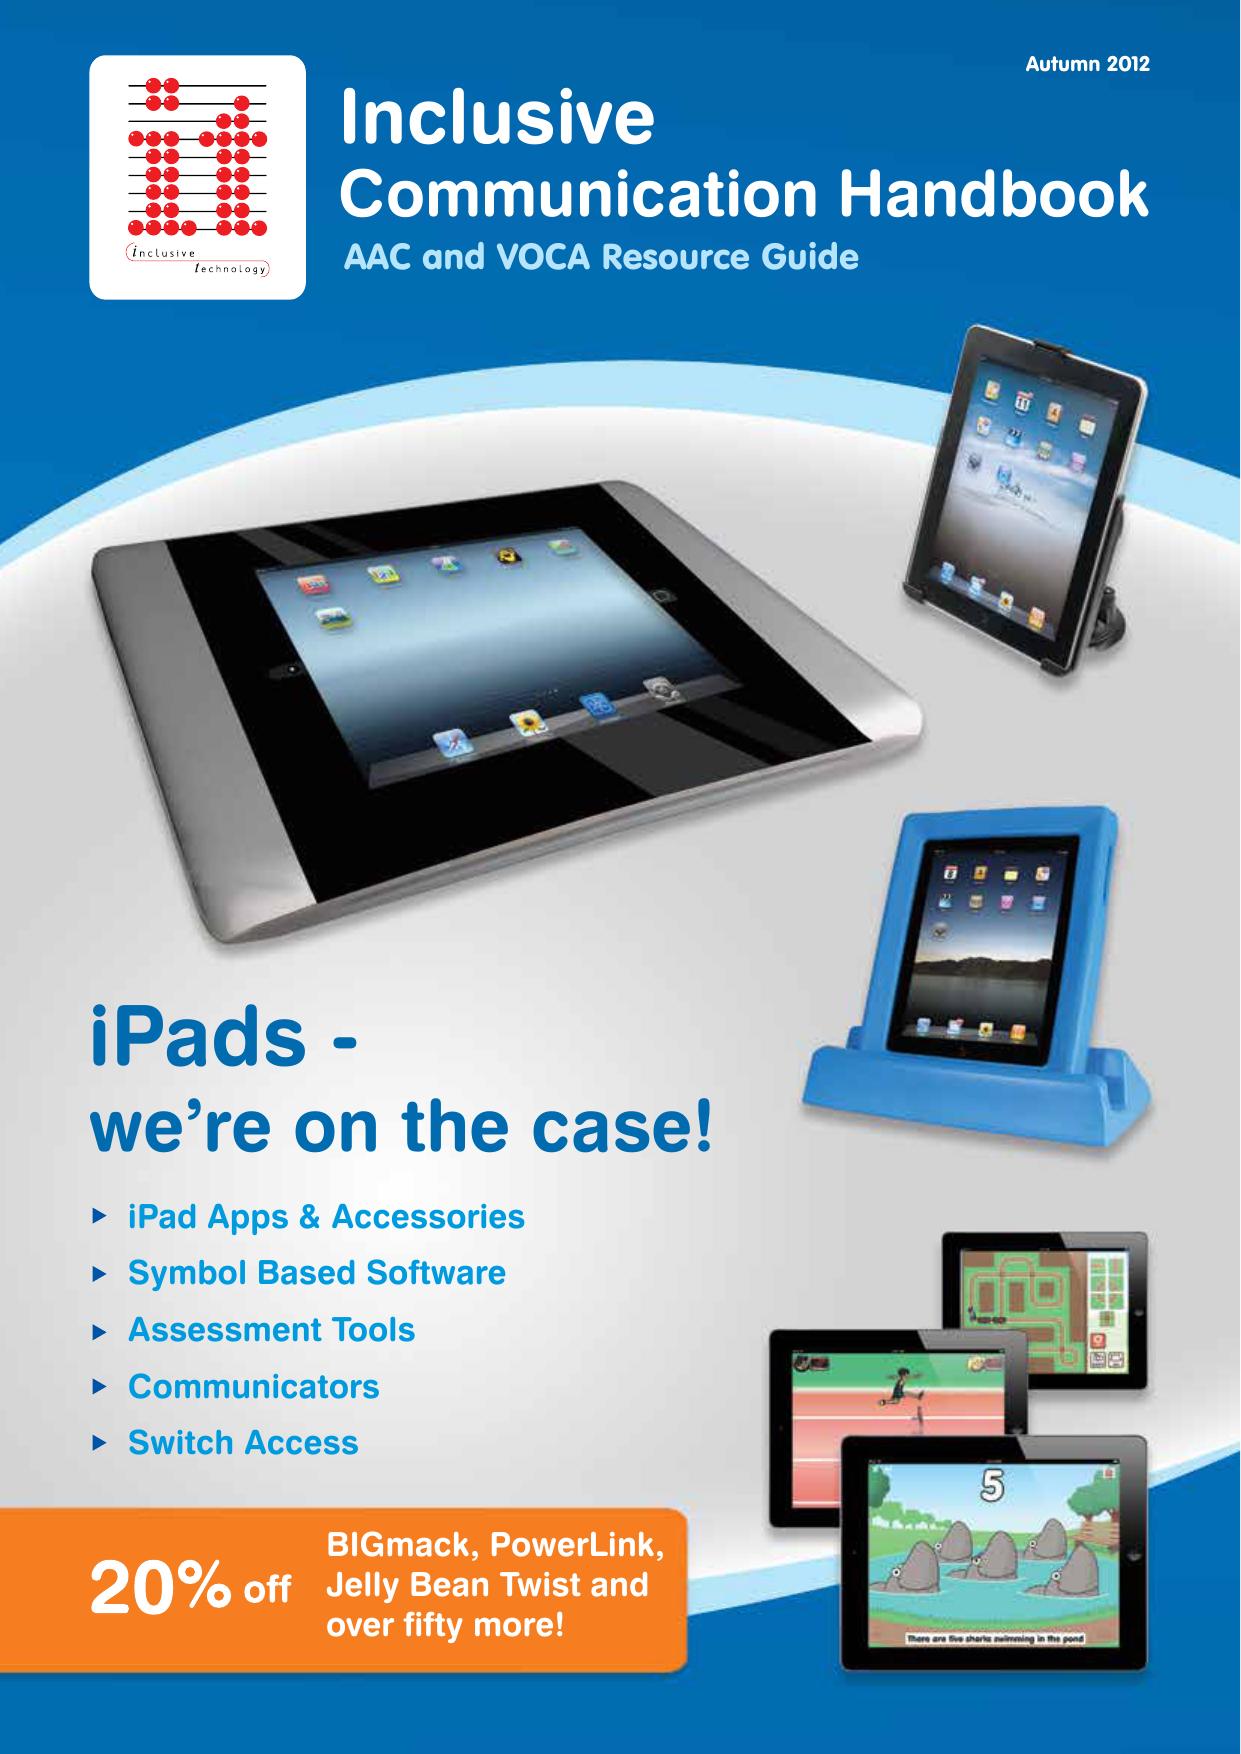 iPads - Inclusive Technology | manualzz com